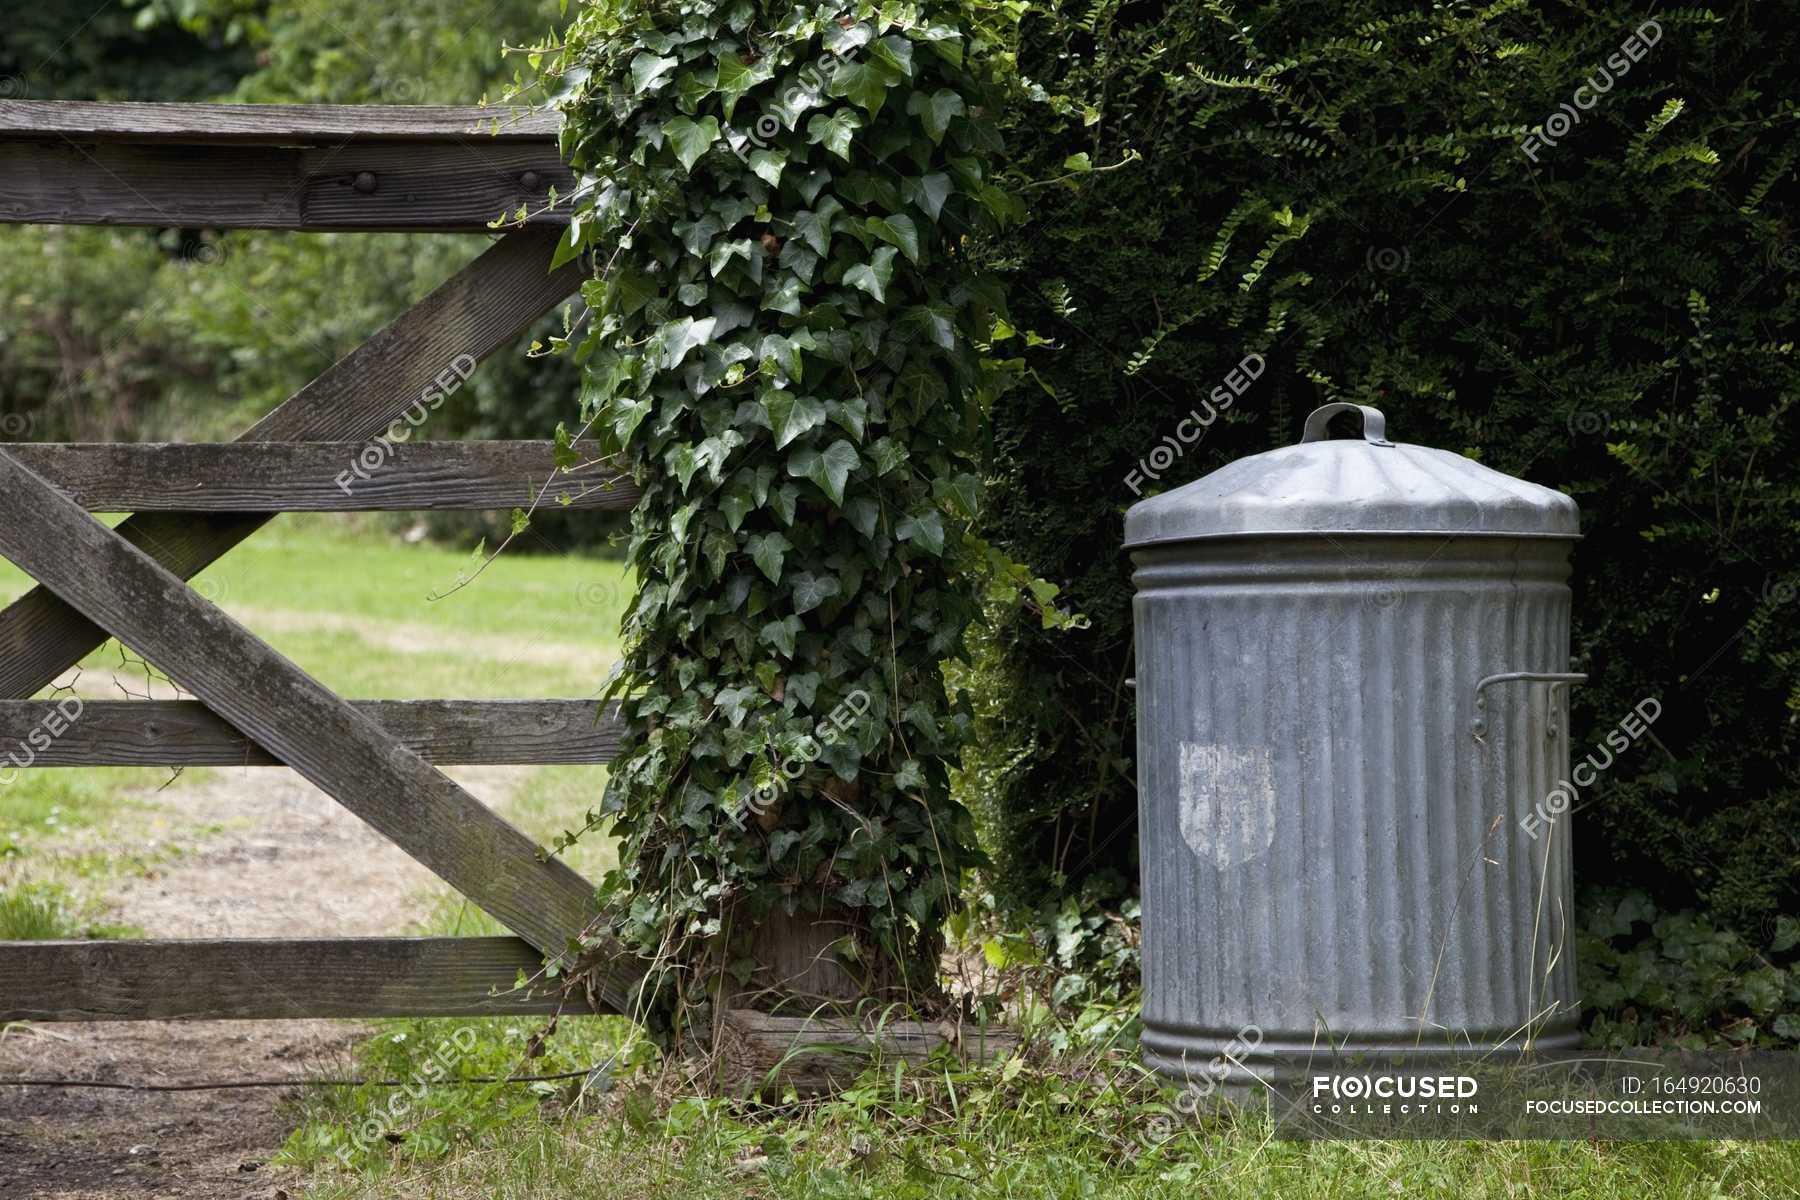 Old Metal Trash Can In Garden Summer